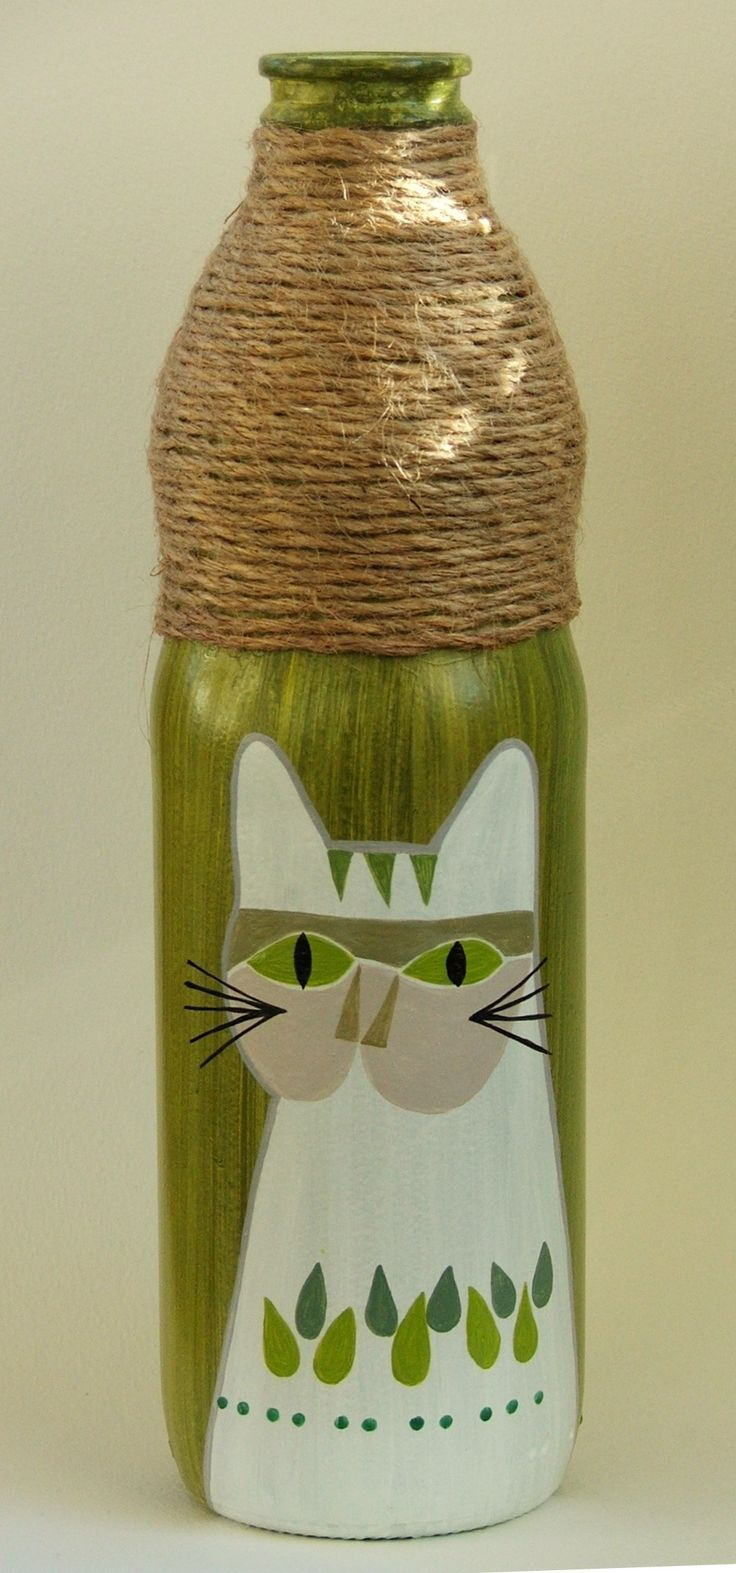 Botella pintada, $70 en https://ofeliafeliz.com.ar